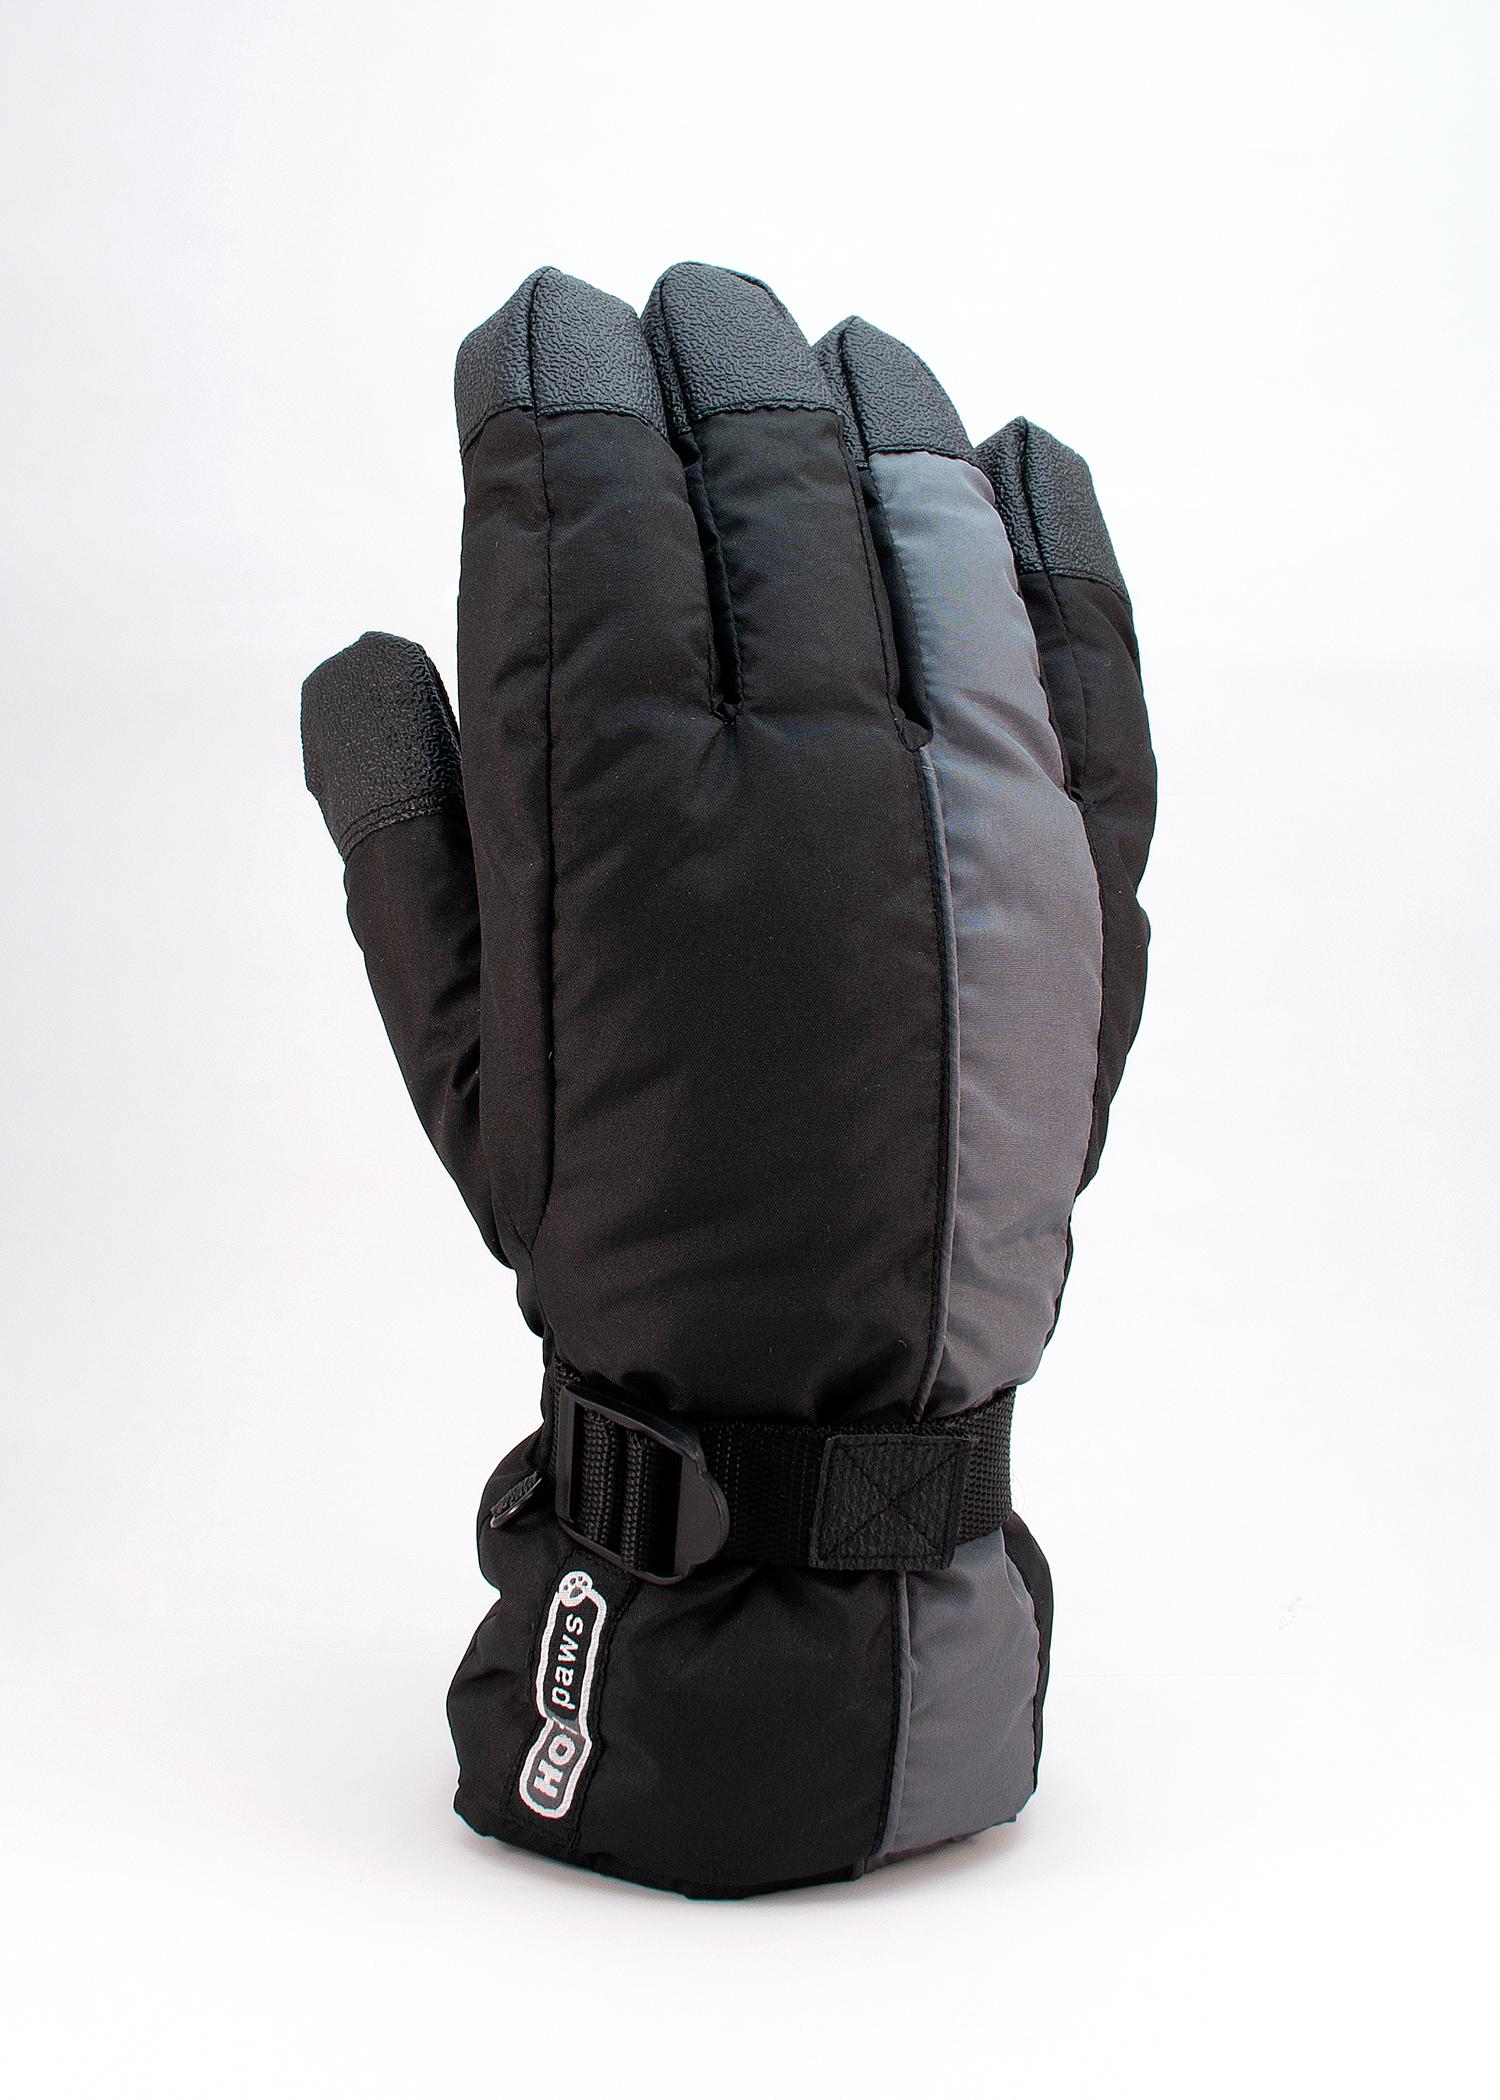 Men's Hot Paws Gaunlet Gloves, Black/Gray, swatch